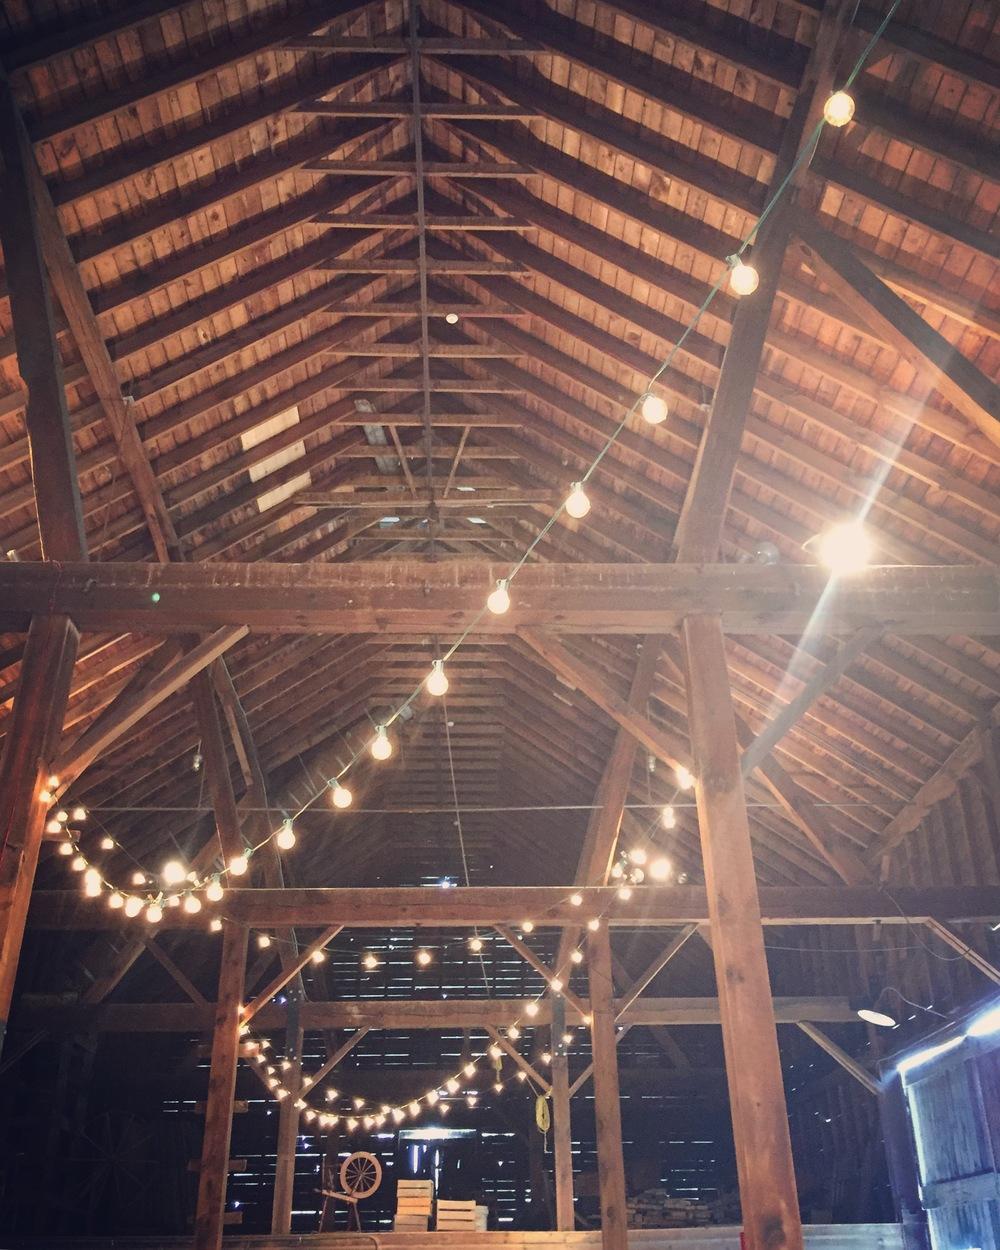 albany barn wedding